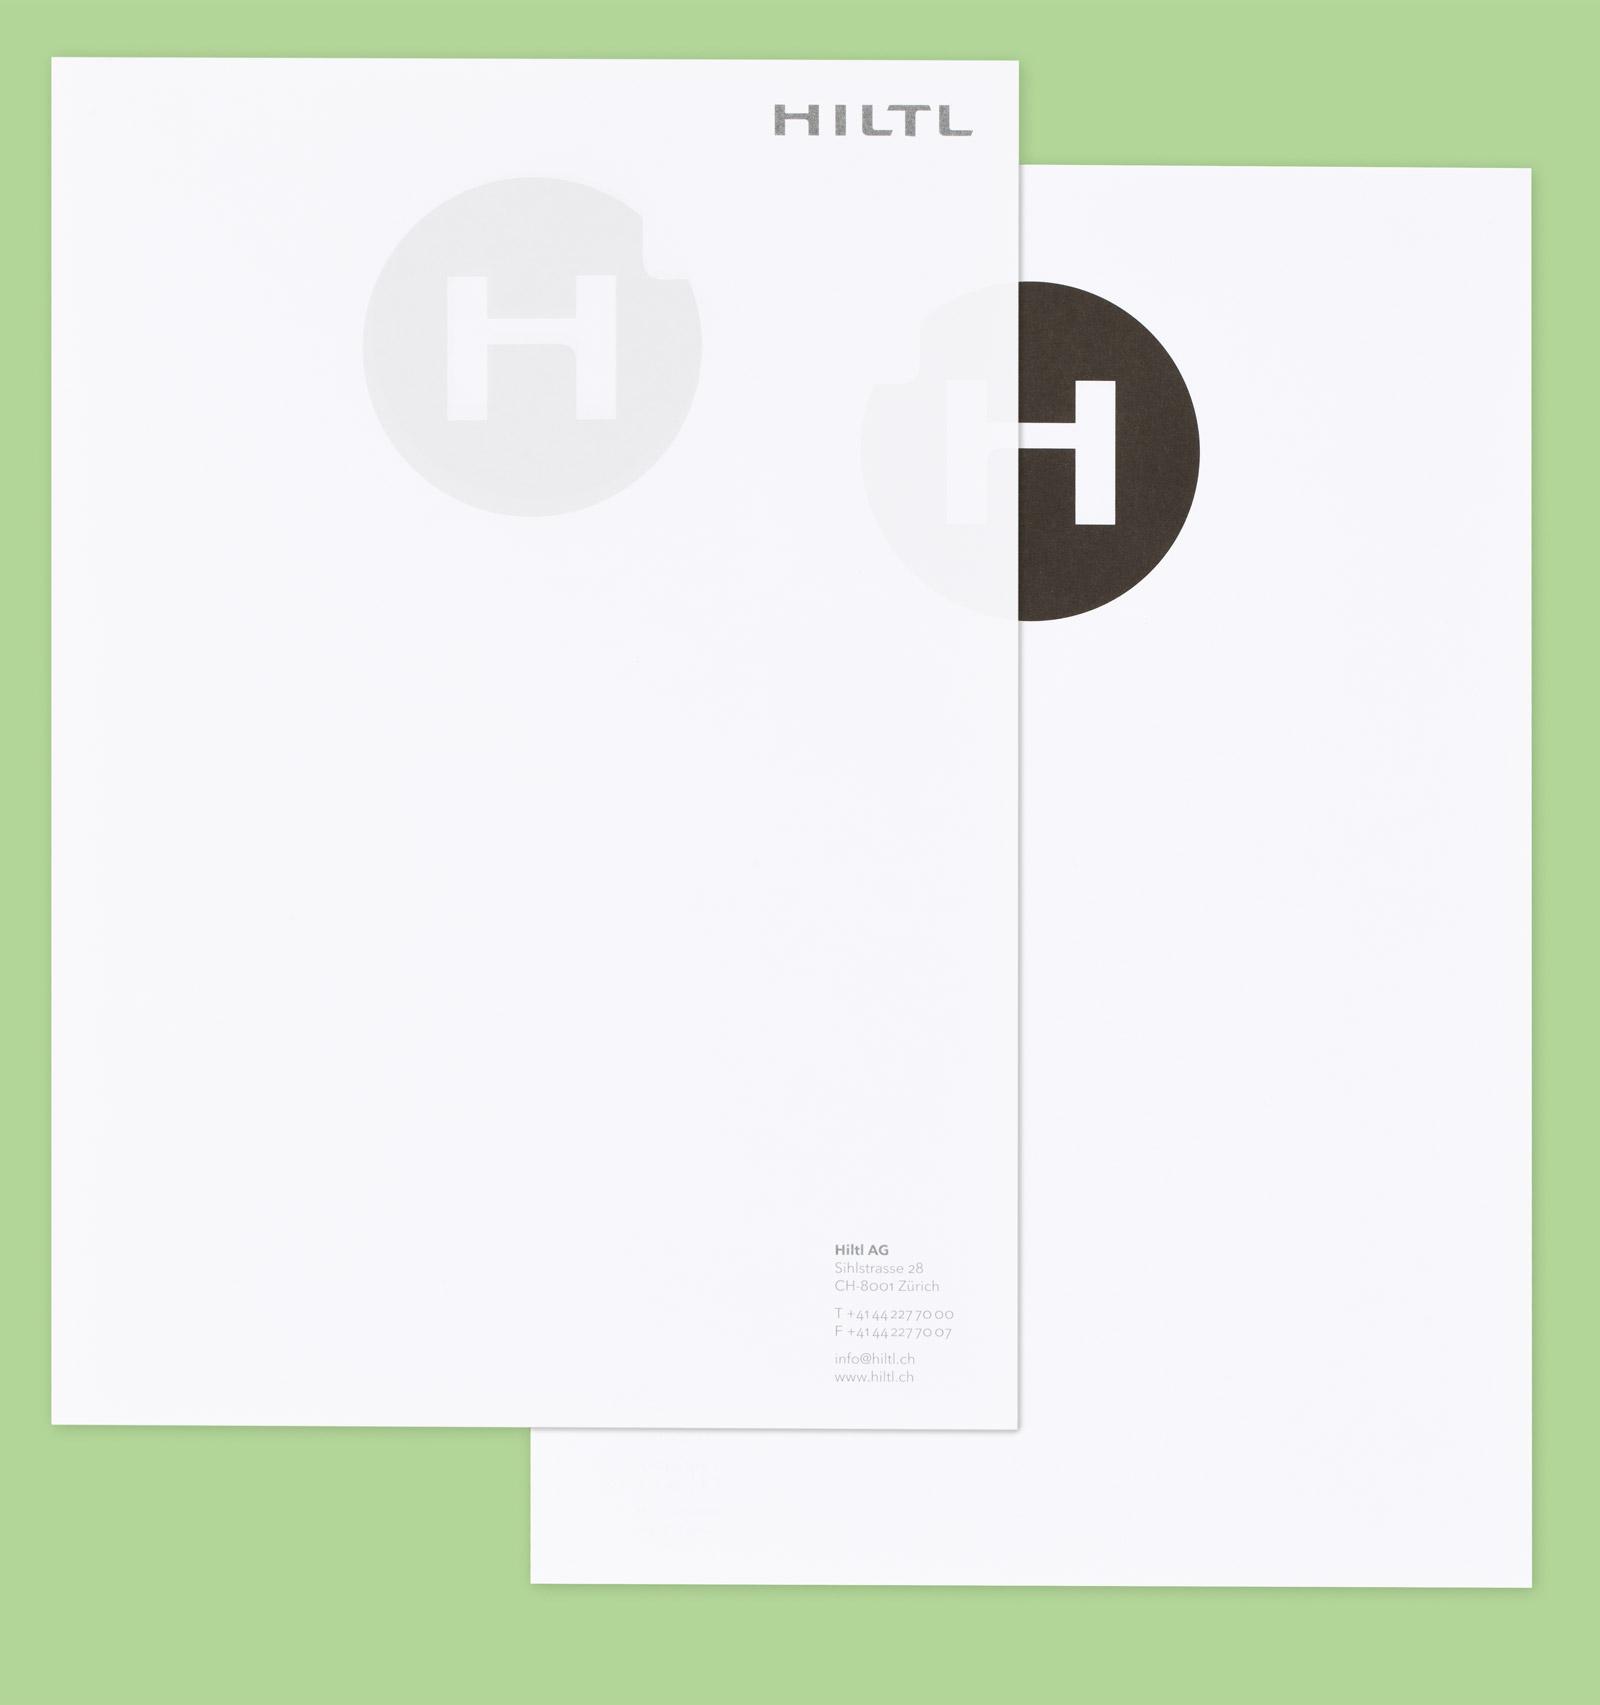 bd-hl-td-brief-01